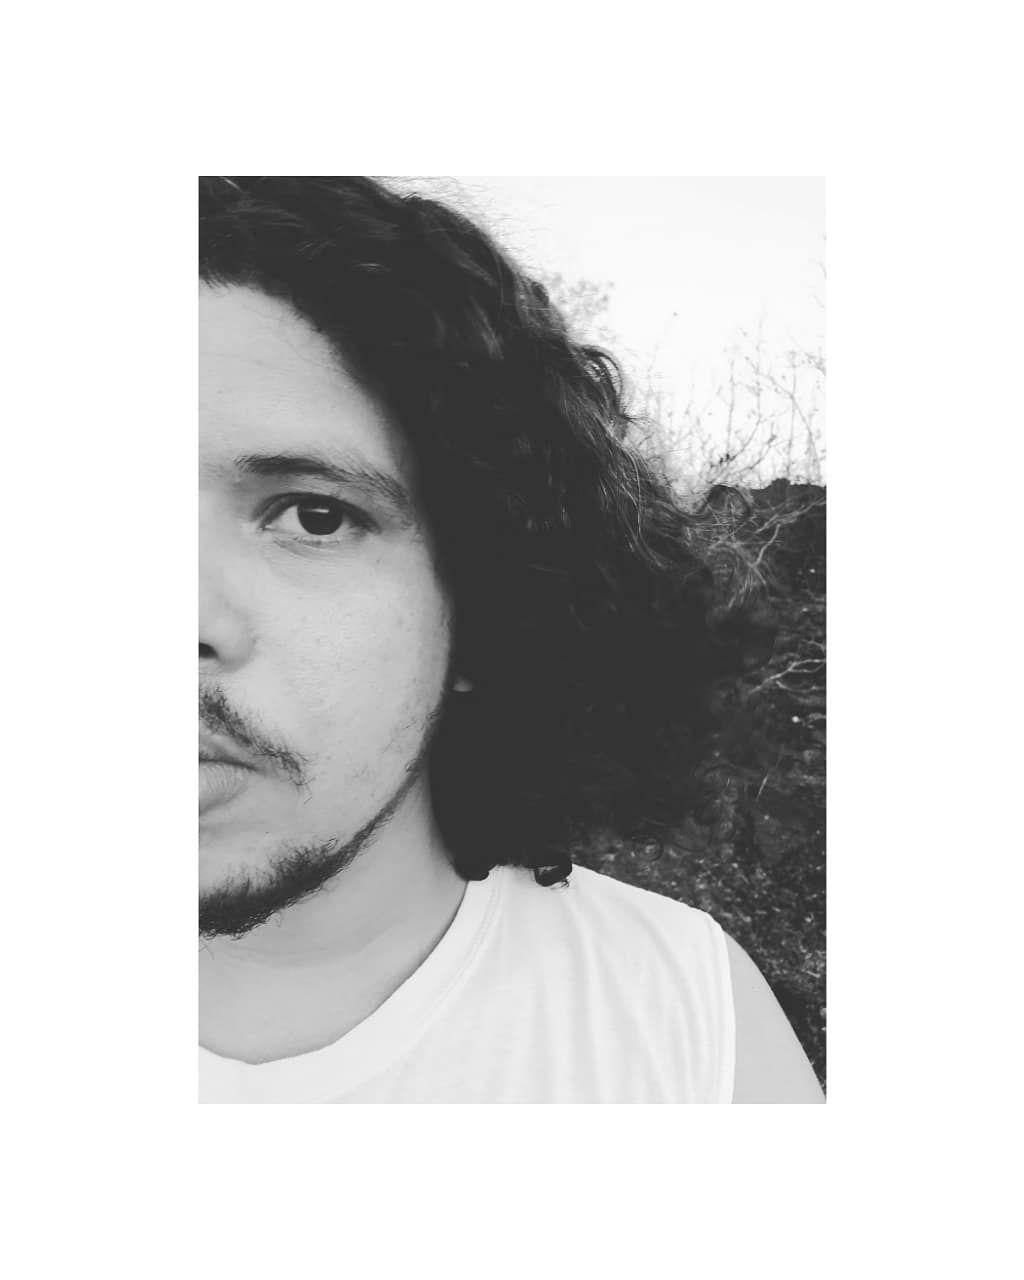 #isntagood #instagraff #cool #instagram #boy #boys#poet #poetry #libro #lectura #write #art #arte #culture #tattooaddict...